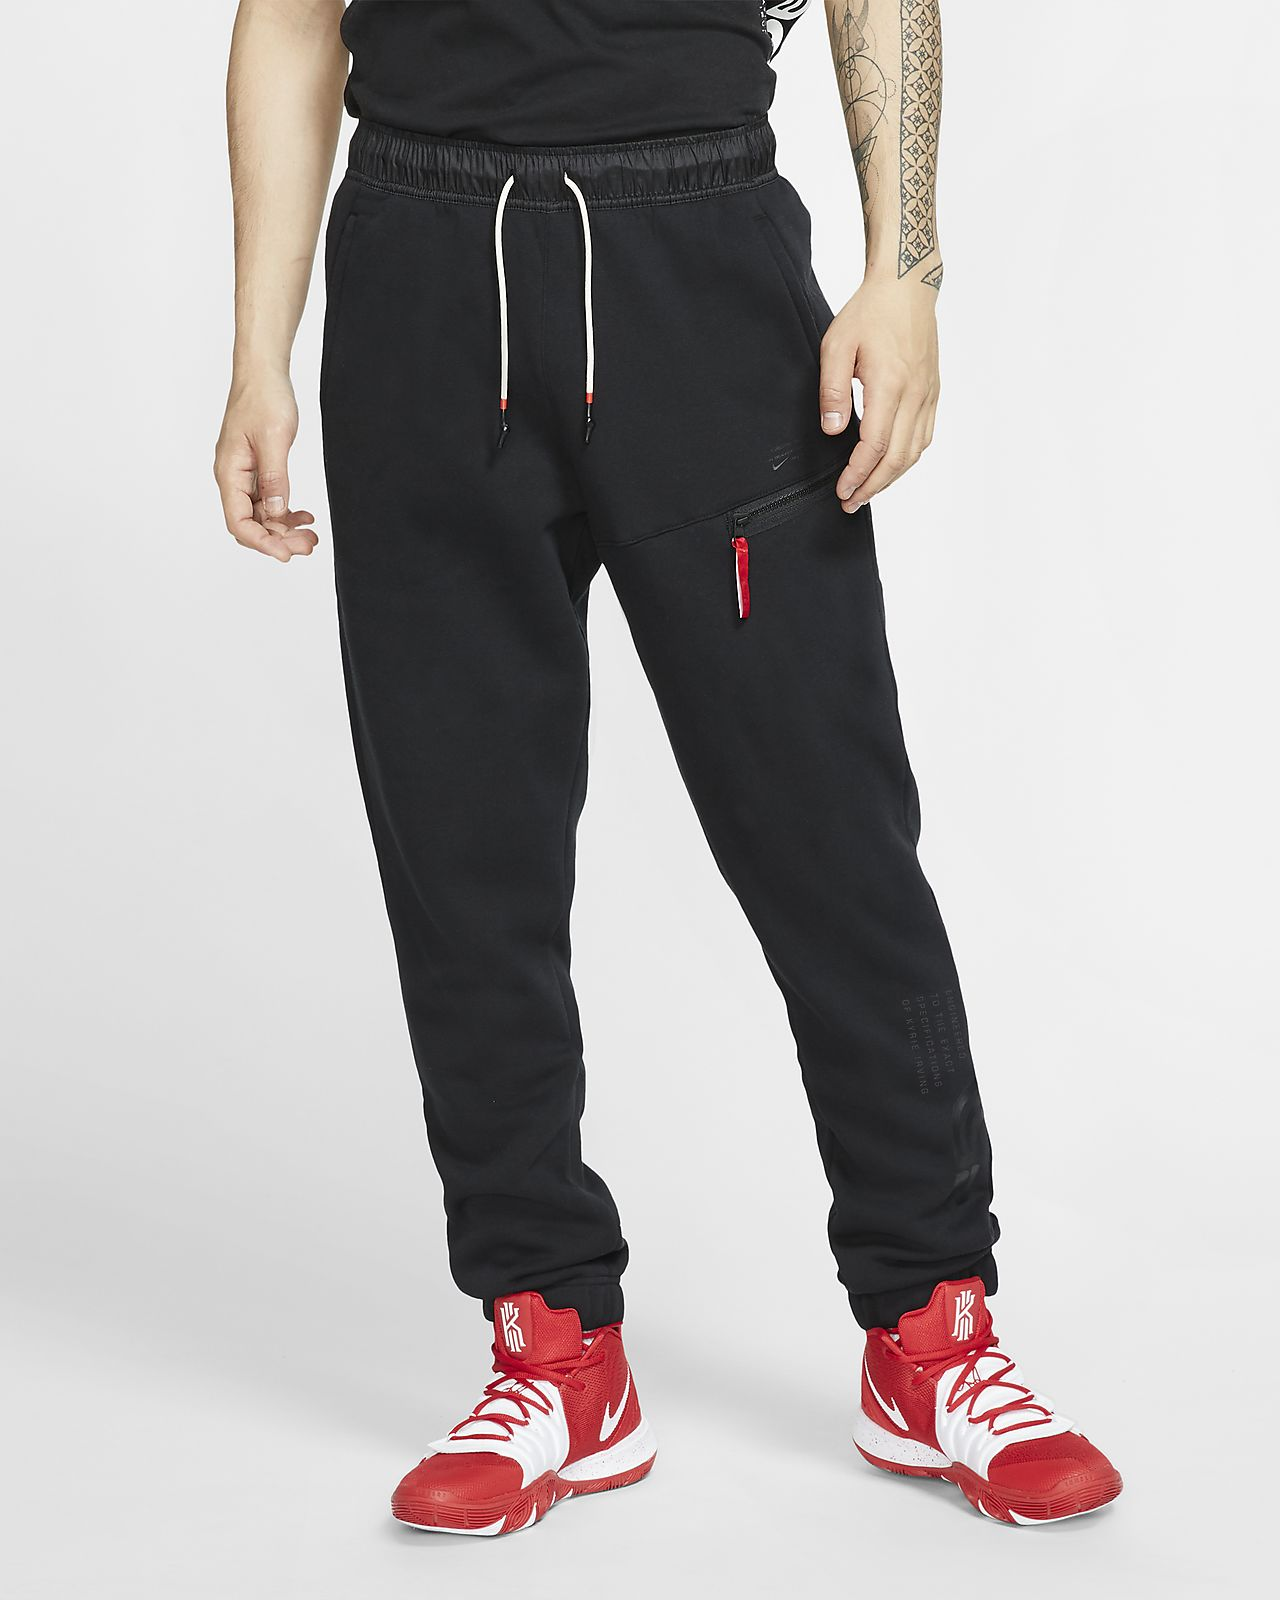 Pantaloni da basket in fleece Kyrie Uomo. Nike IT